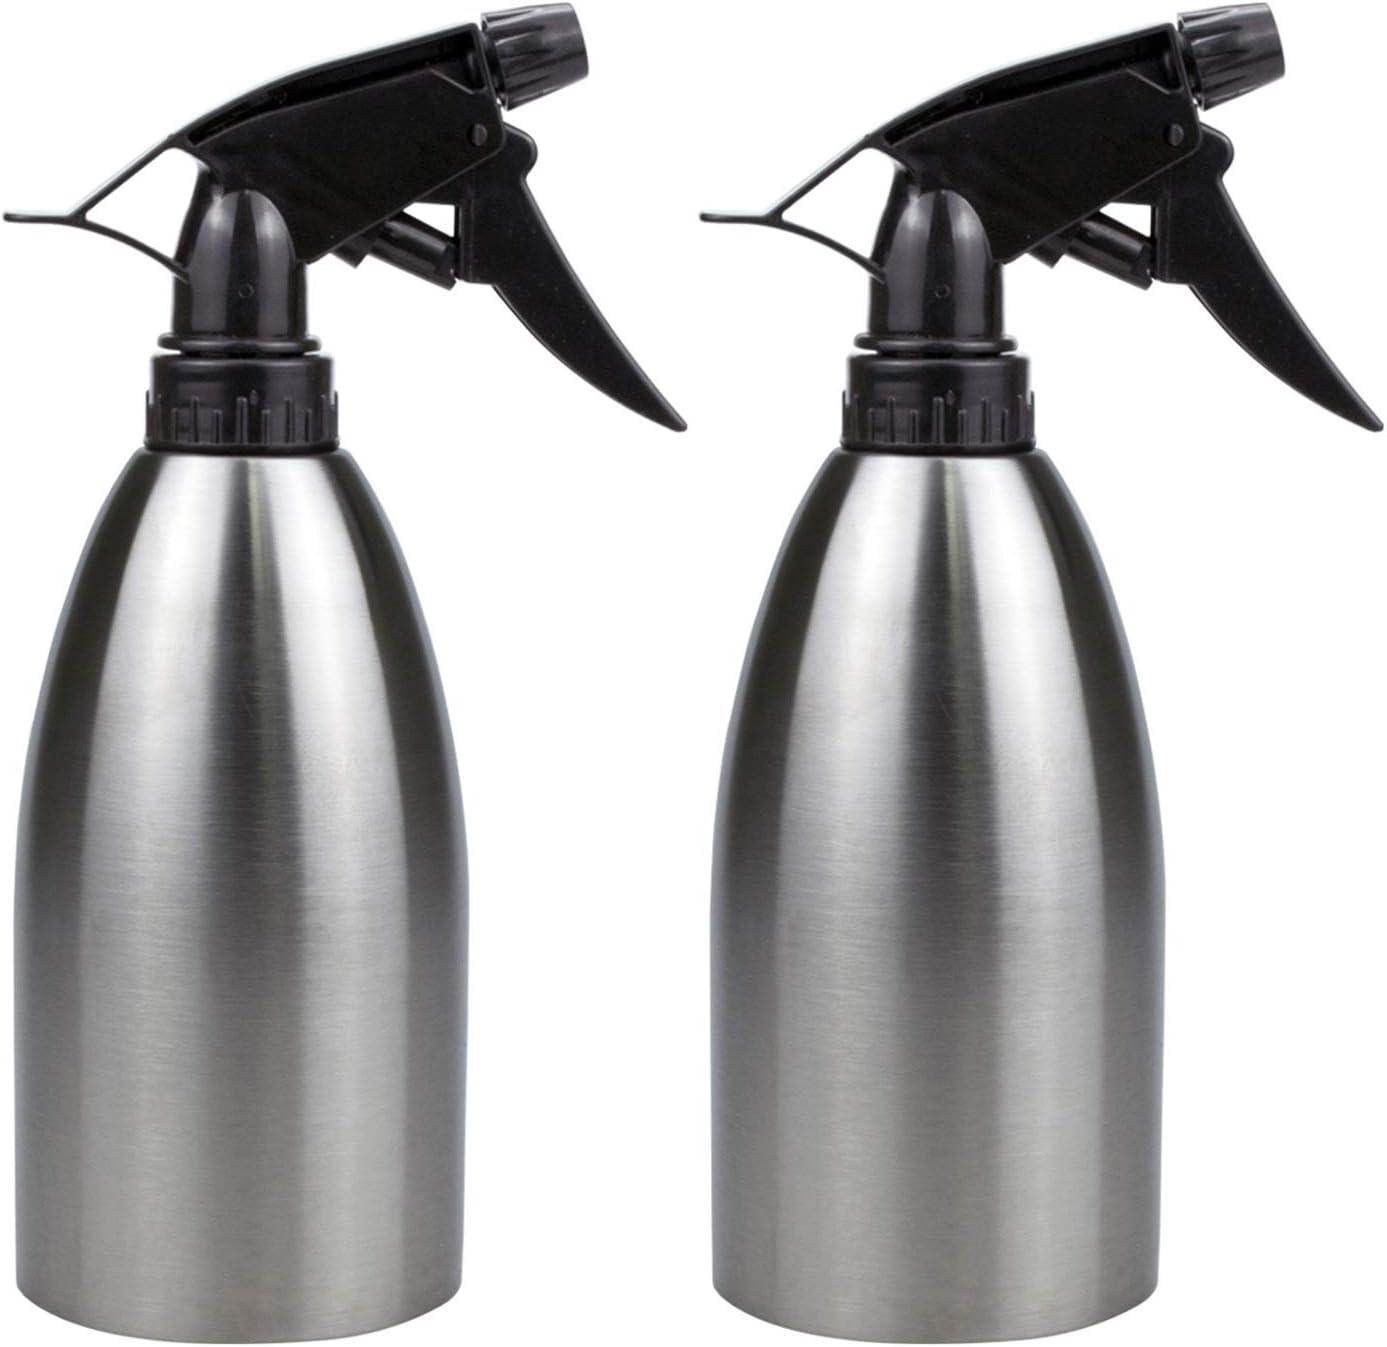 Yesland 2 Pack Stainless Spray Bottle, 17 Oz Vinegar Sprayer Dispenser/Portable Washing Liquid Seasoning Water Sprayer for BBQ, Cooking, Frying and Grilling